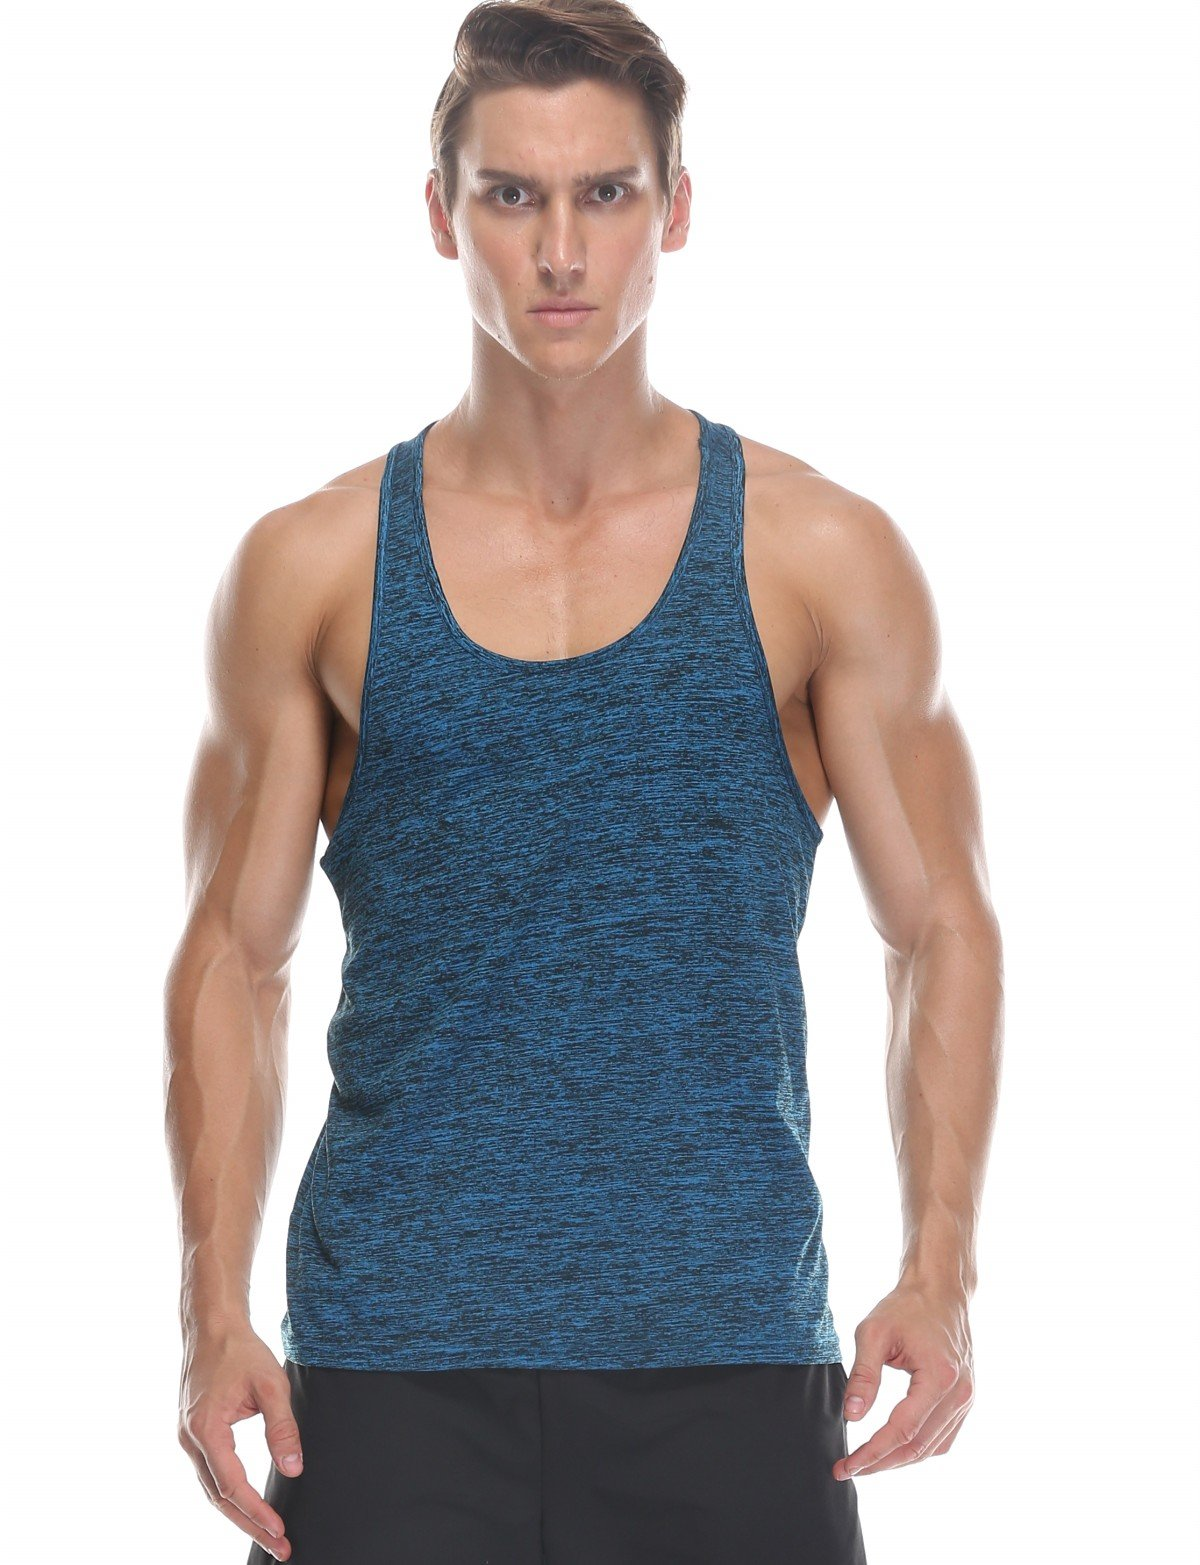 0768d23062422 Men s Muscle Gym Workout Tank Tops Vest Compression Sleeveless Tshirt for  Men